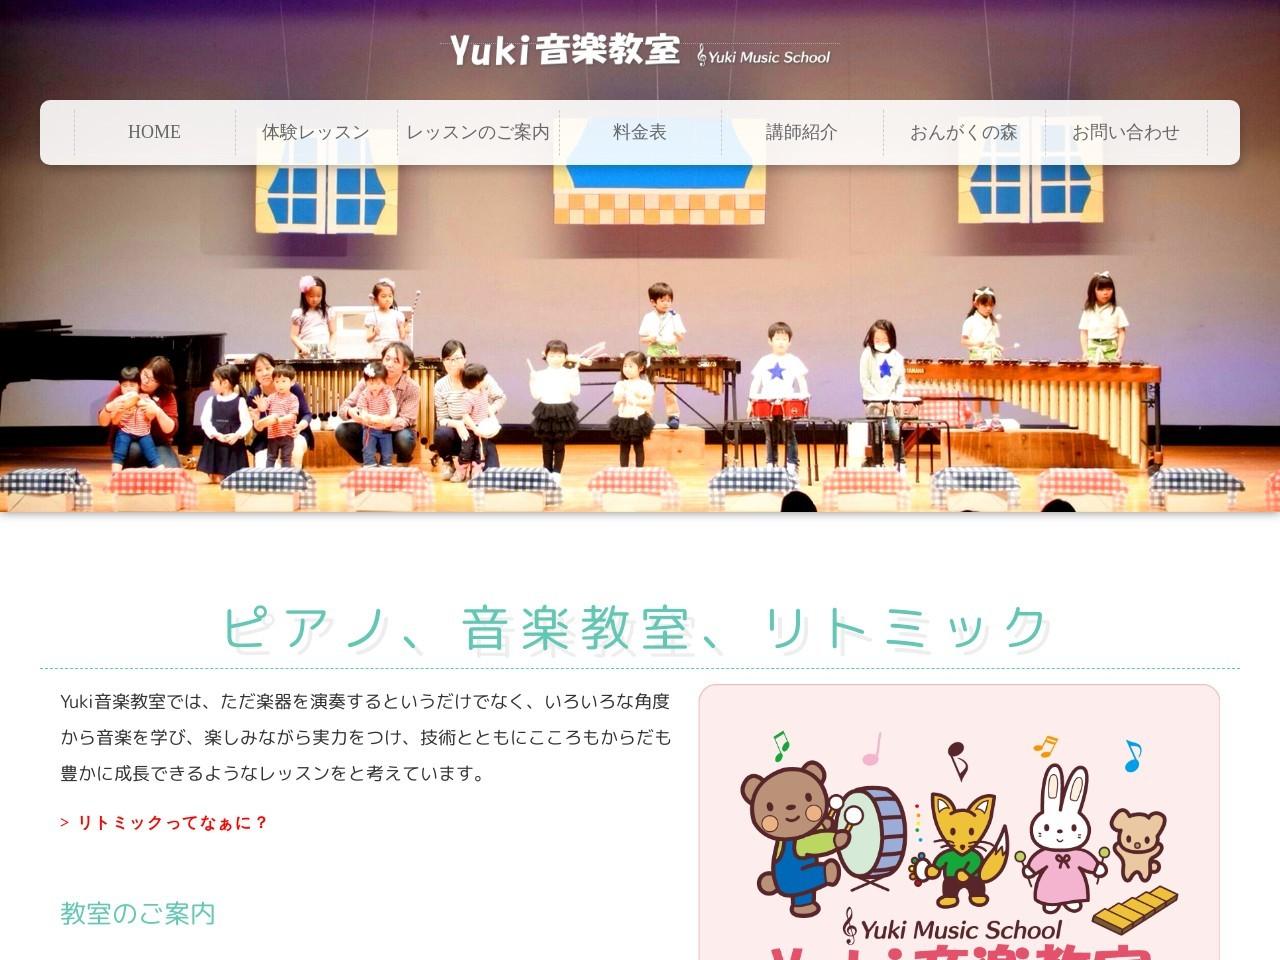 Yuki音楽教室のサムネイル